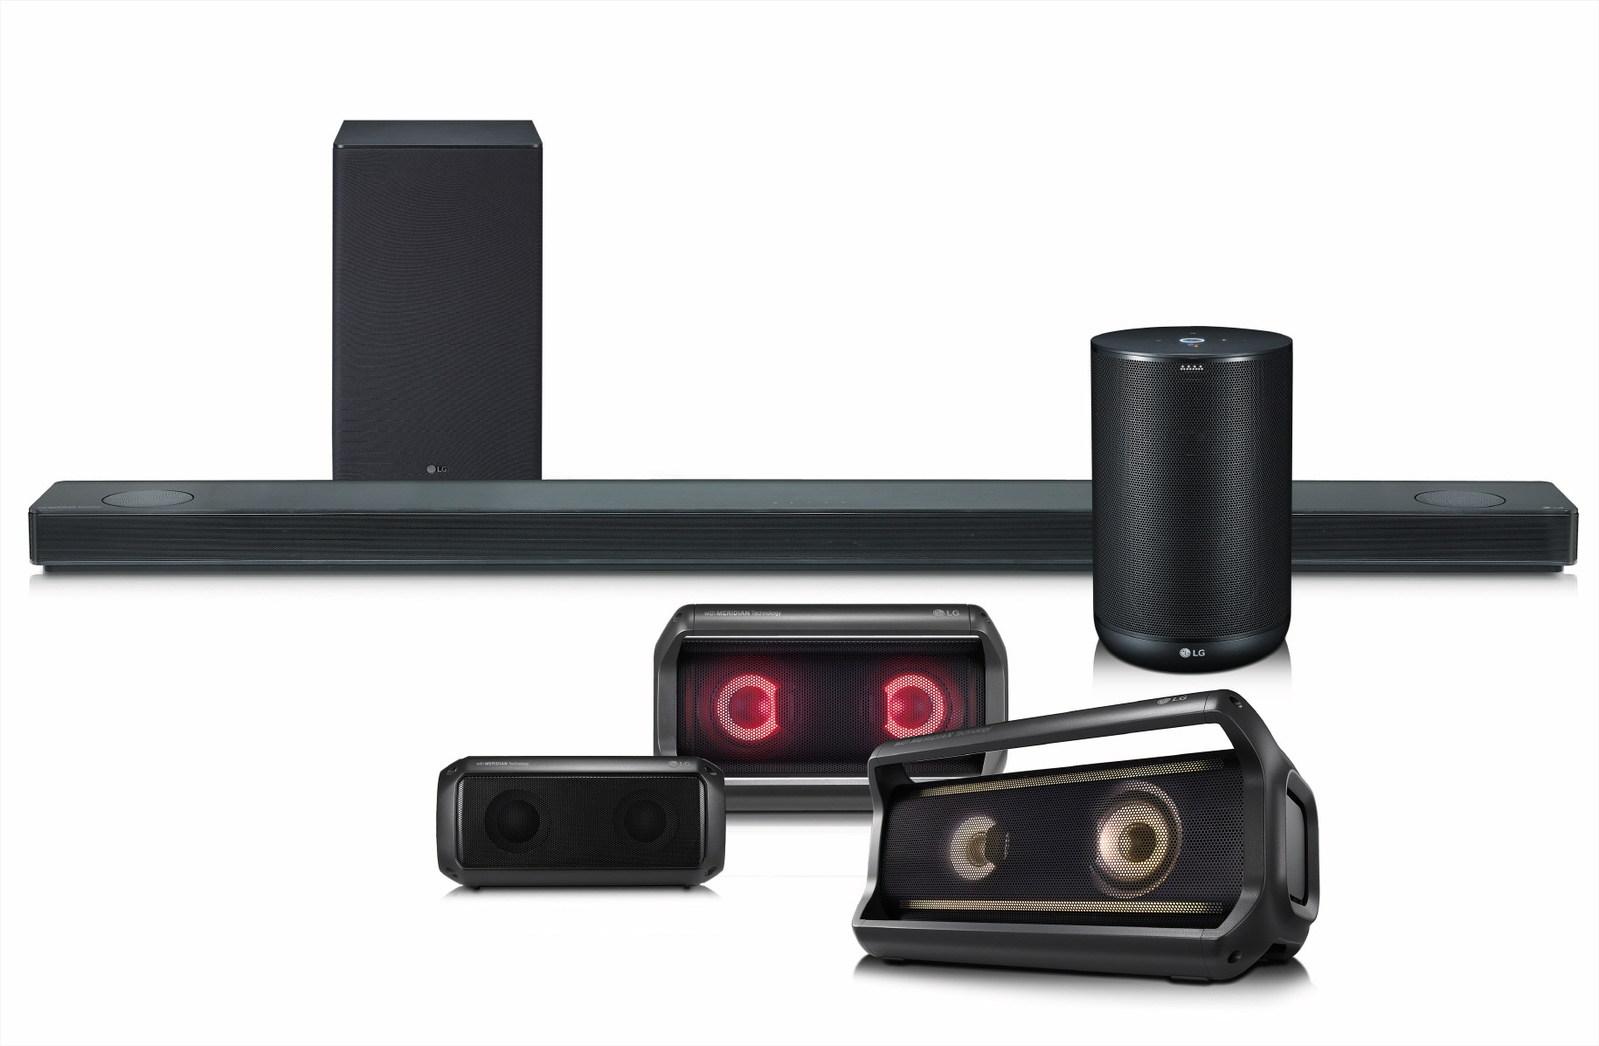 LG introduces Chromecast soundbar and Google Assistant smart speaker